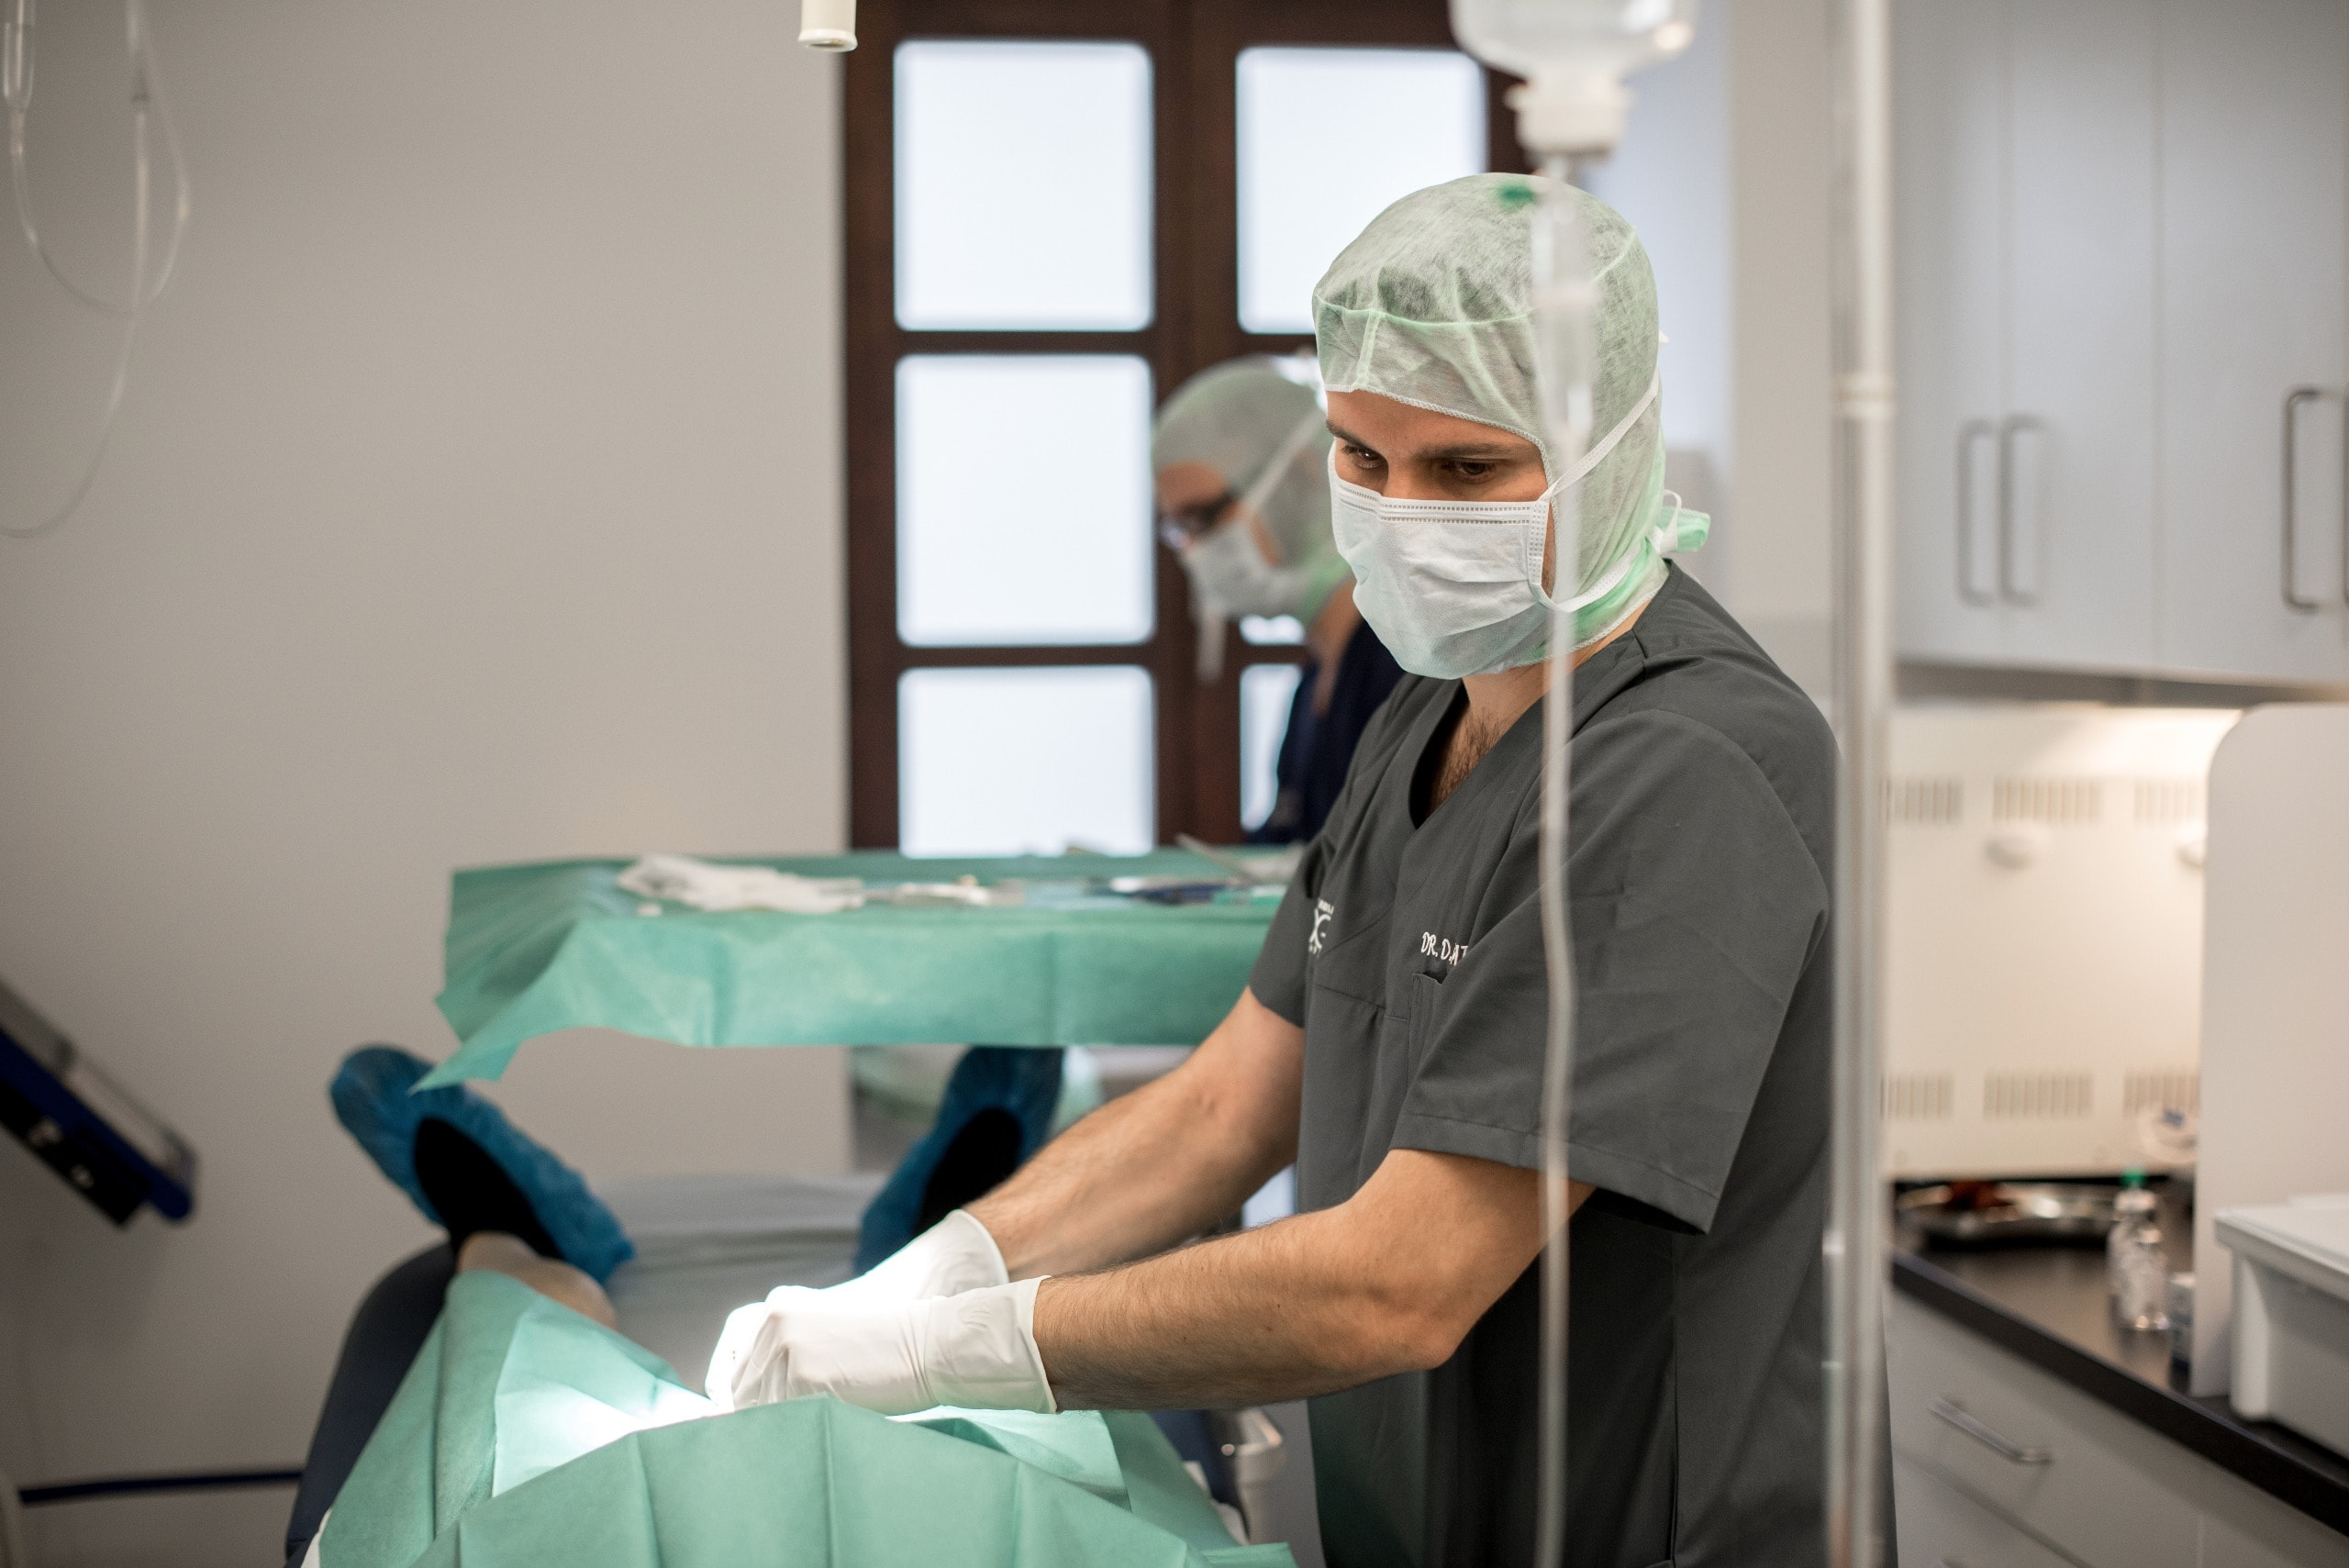 Ablauf beschneidung Beschneidung beim